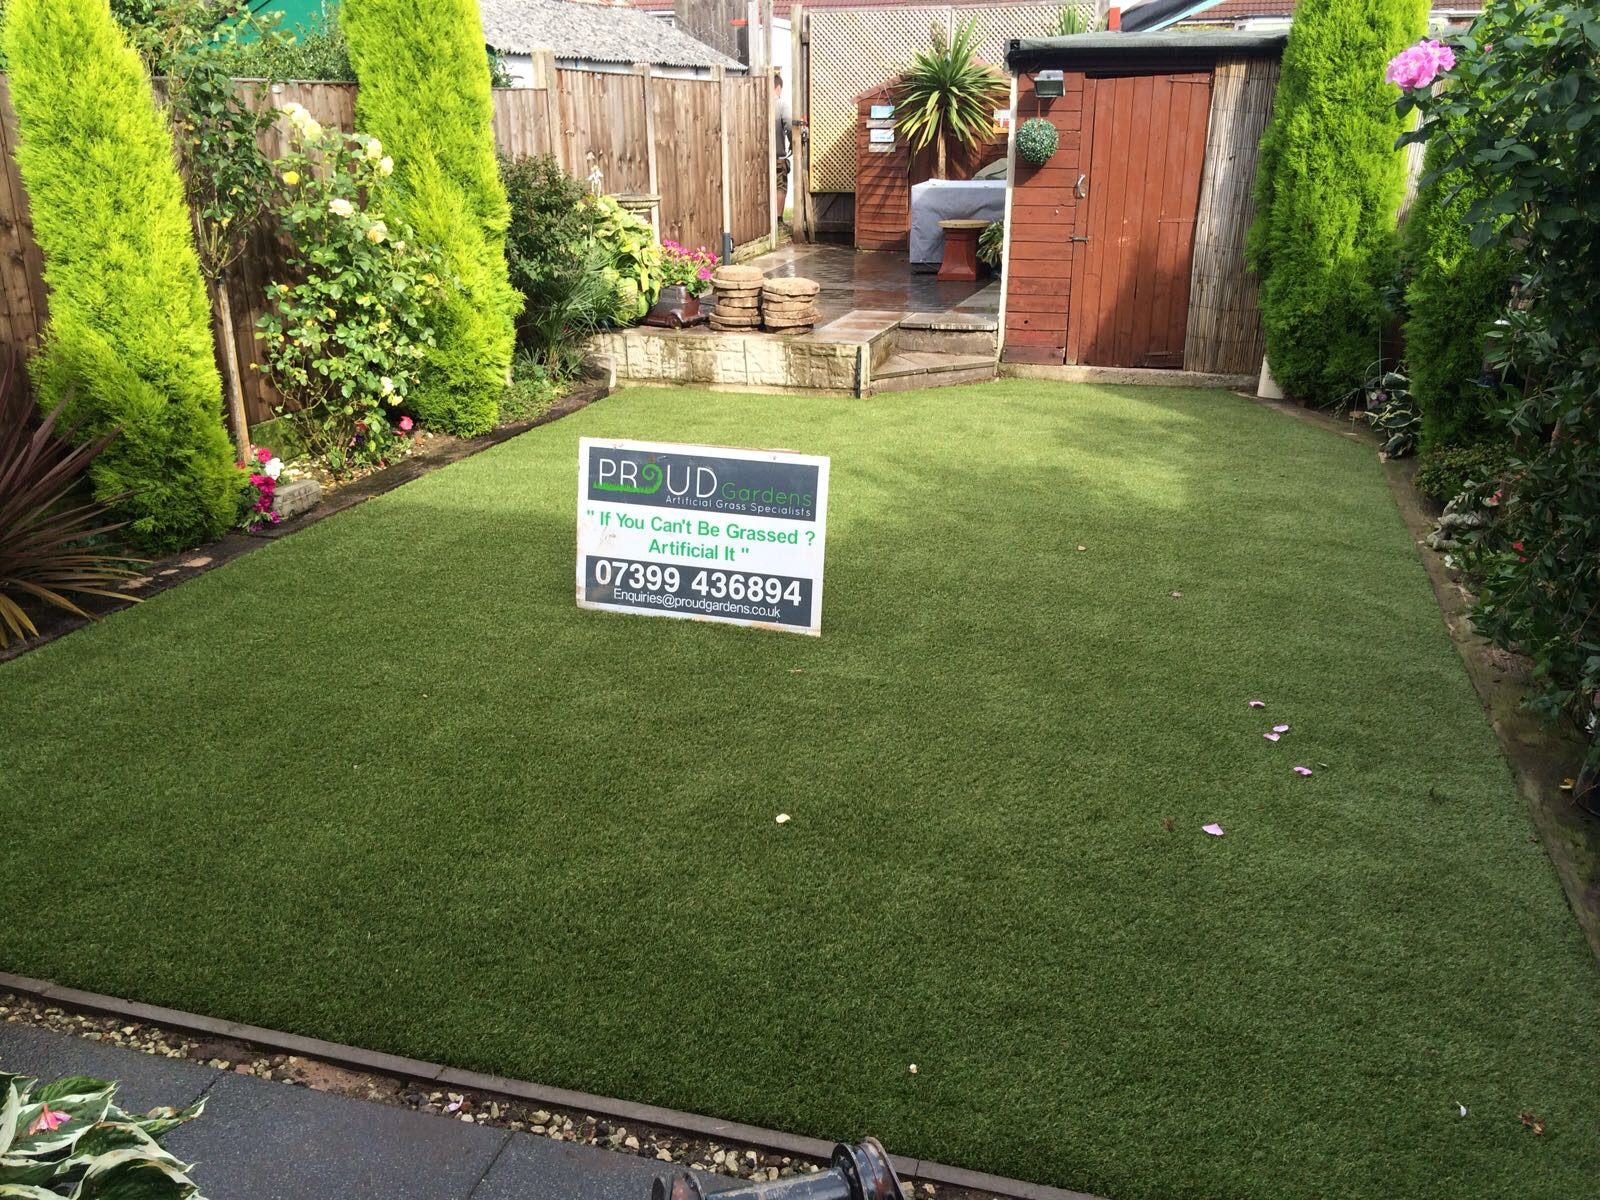 Artificial Grass in the backyard